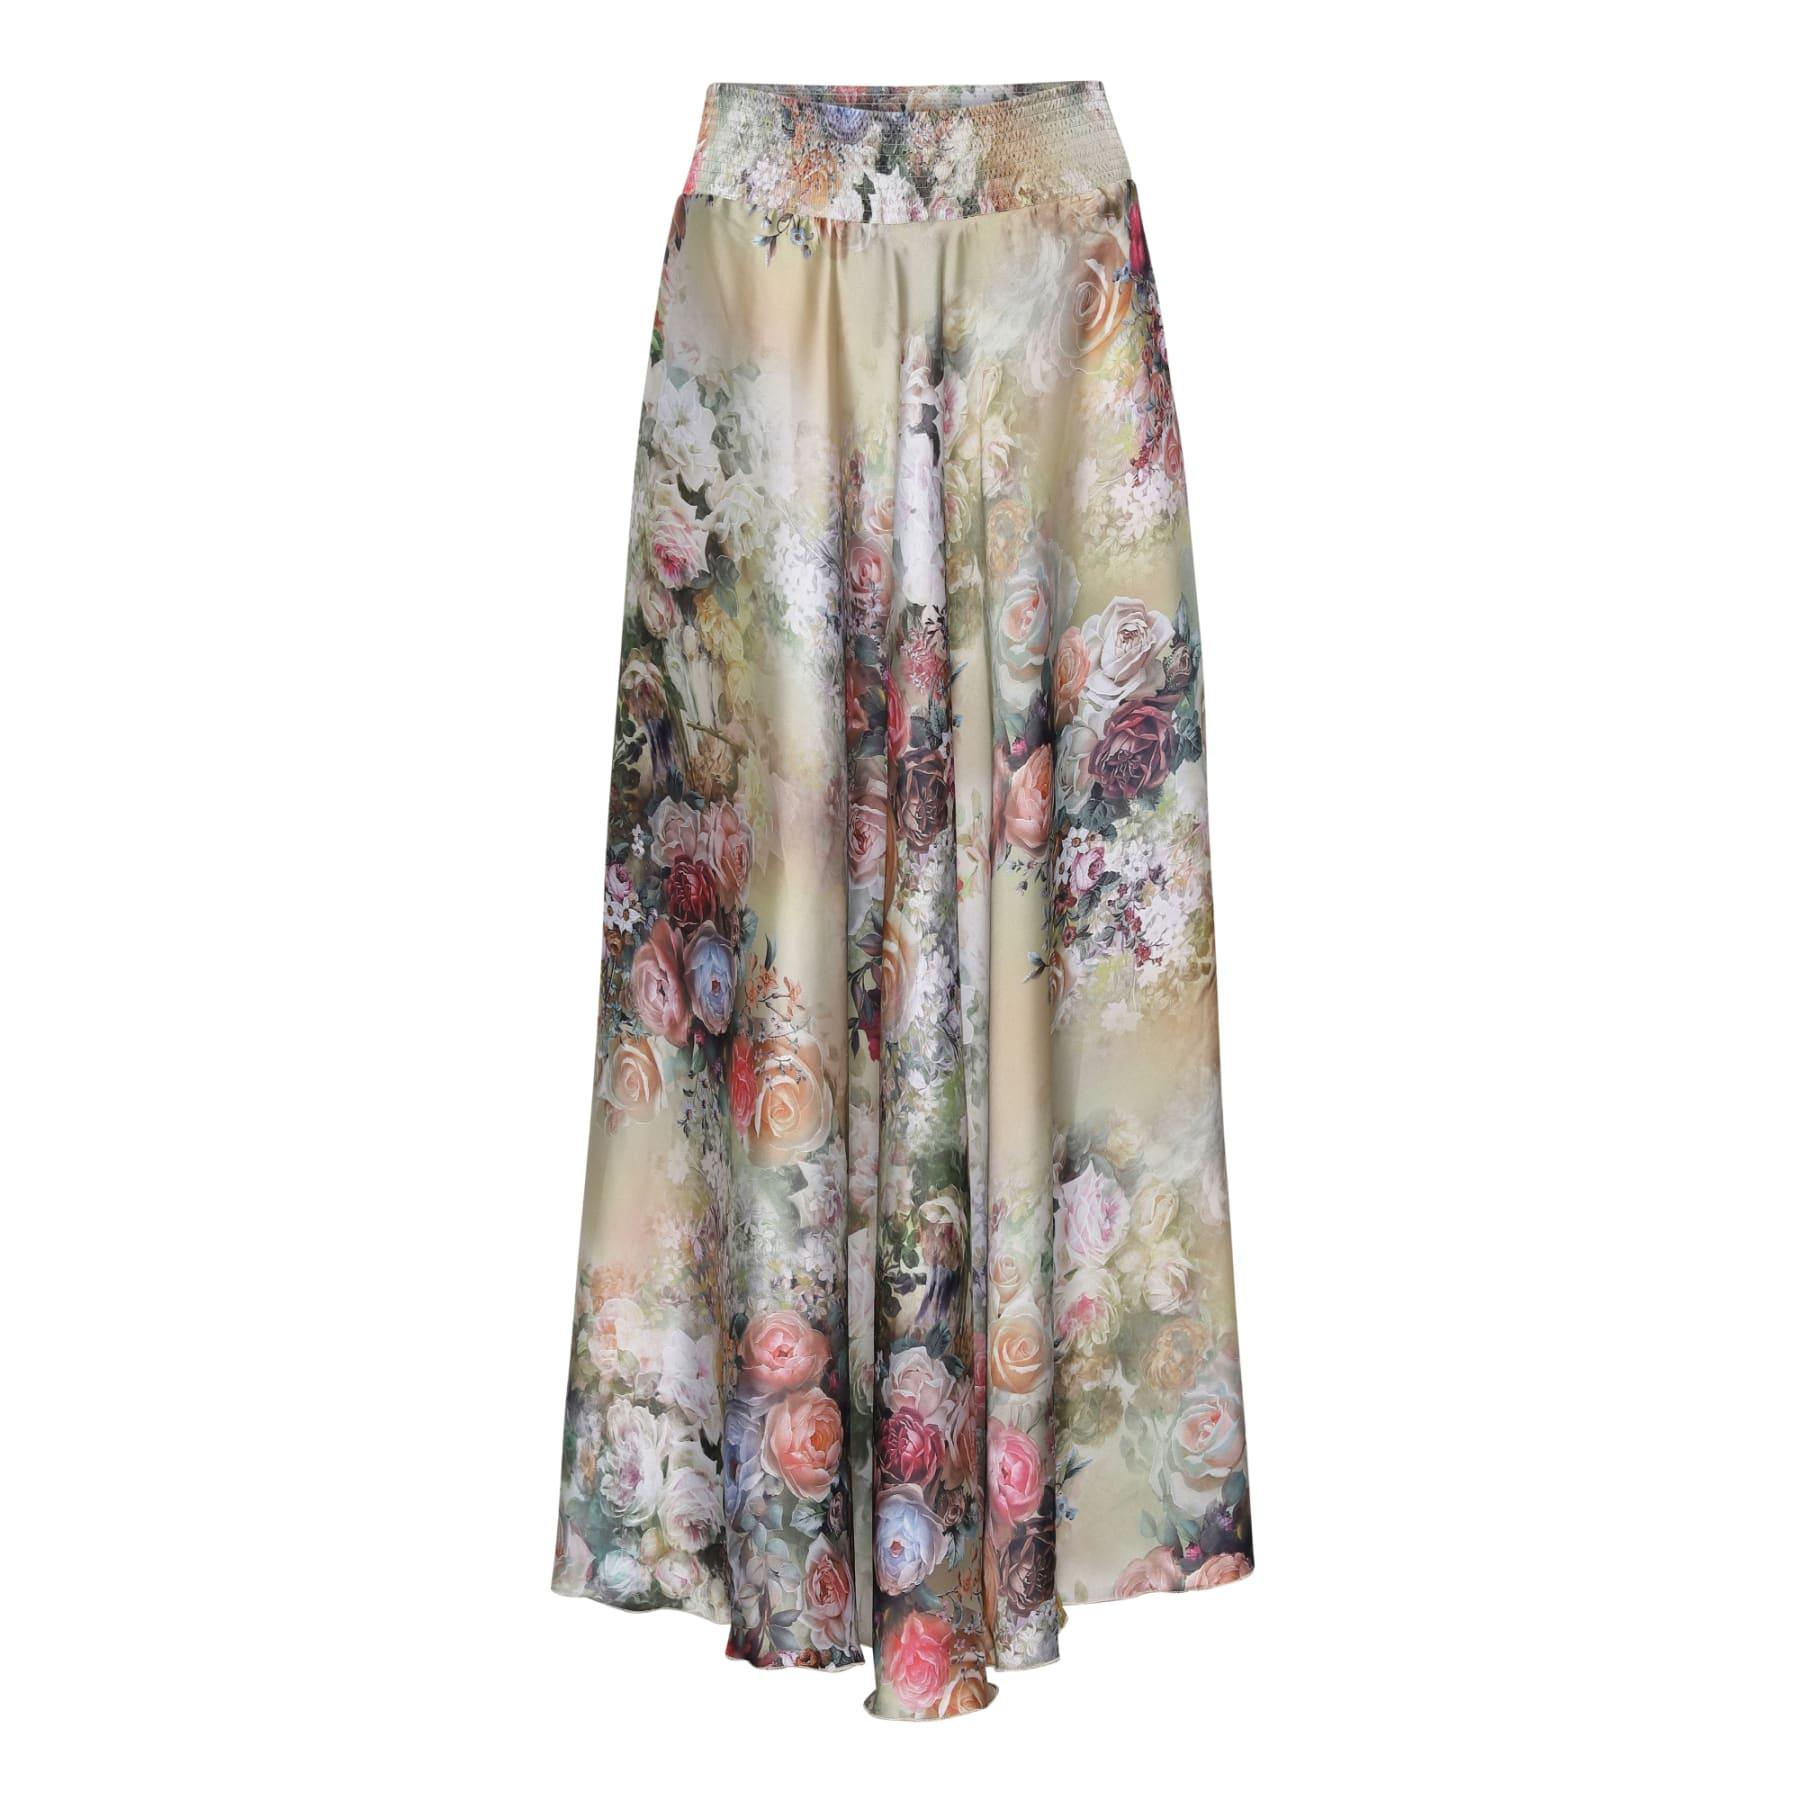 Savannah Skirt - Fleur Gold KARMAMIA IMAGE BY ME